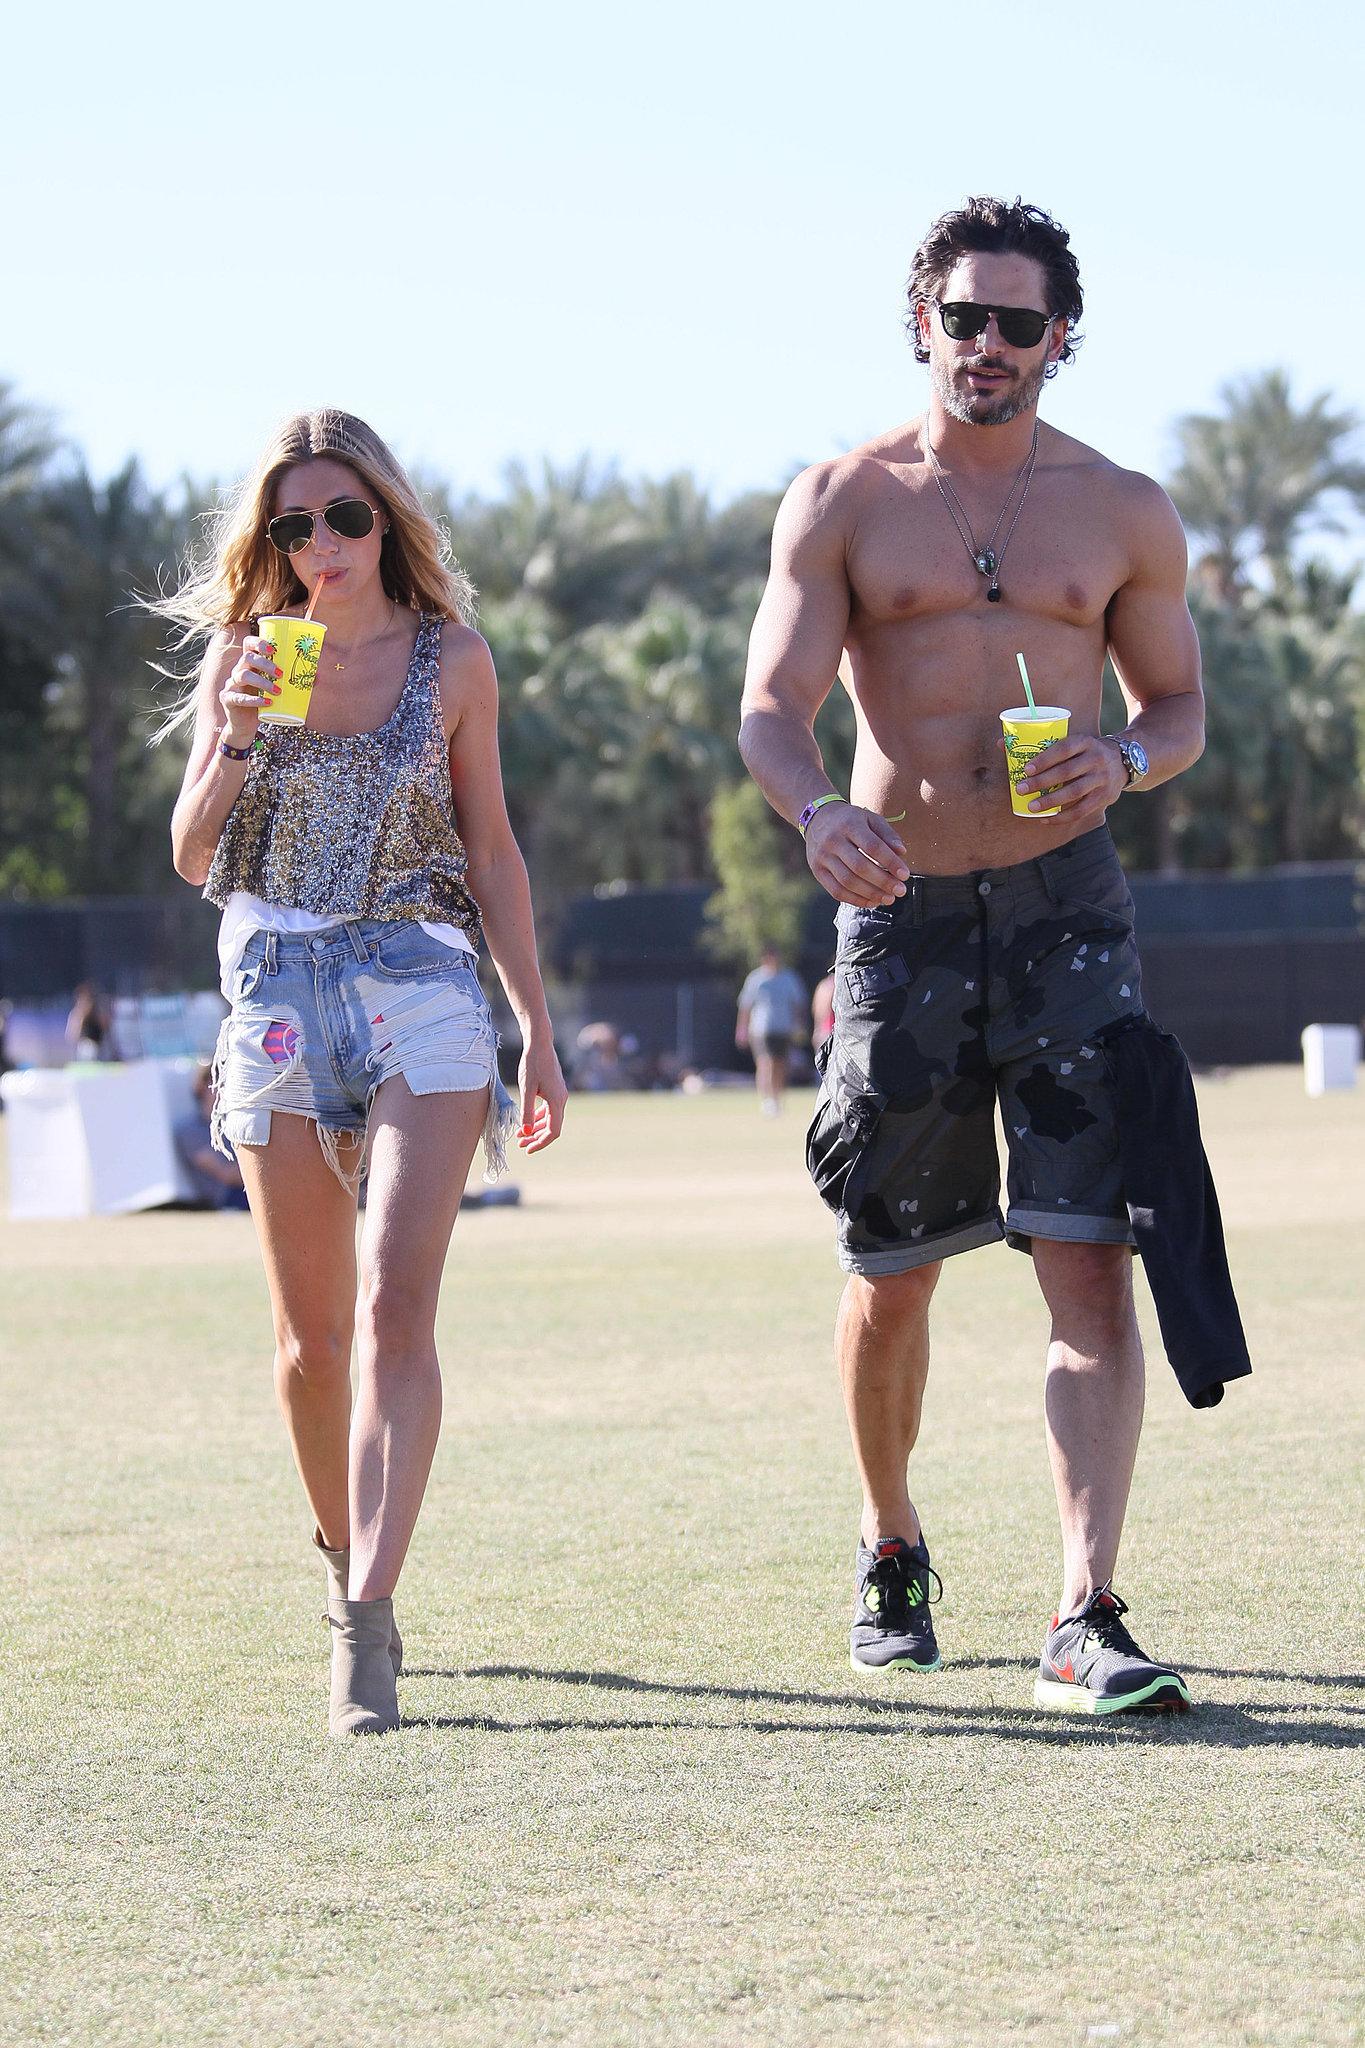 Joe Manganiello went shirtless in the desert at weekend two of Coachella 2012.